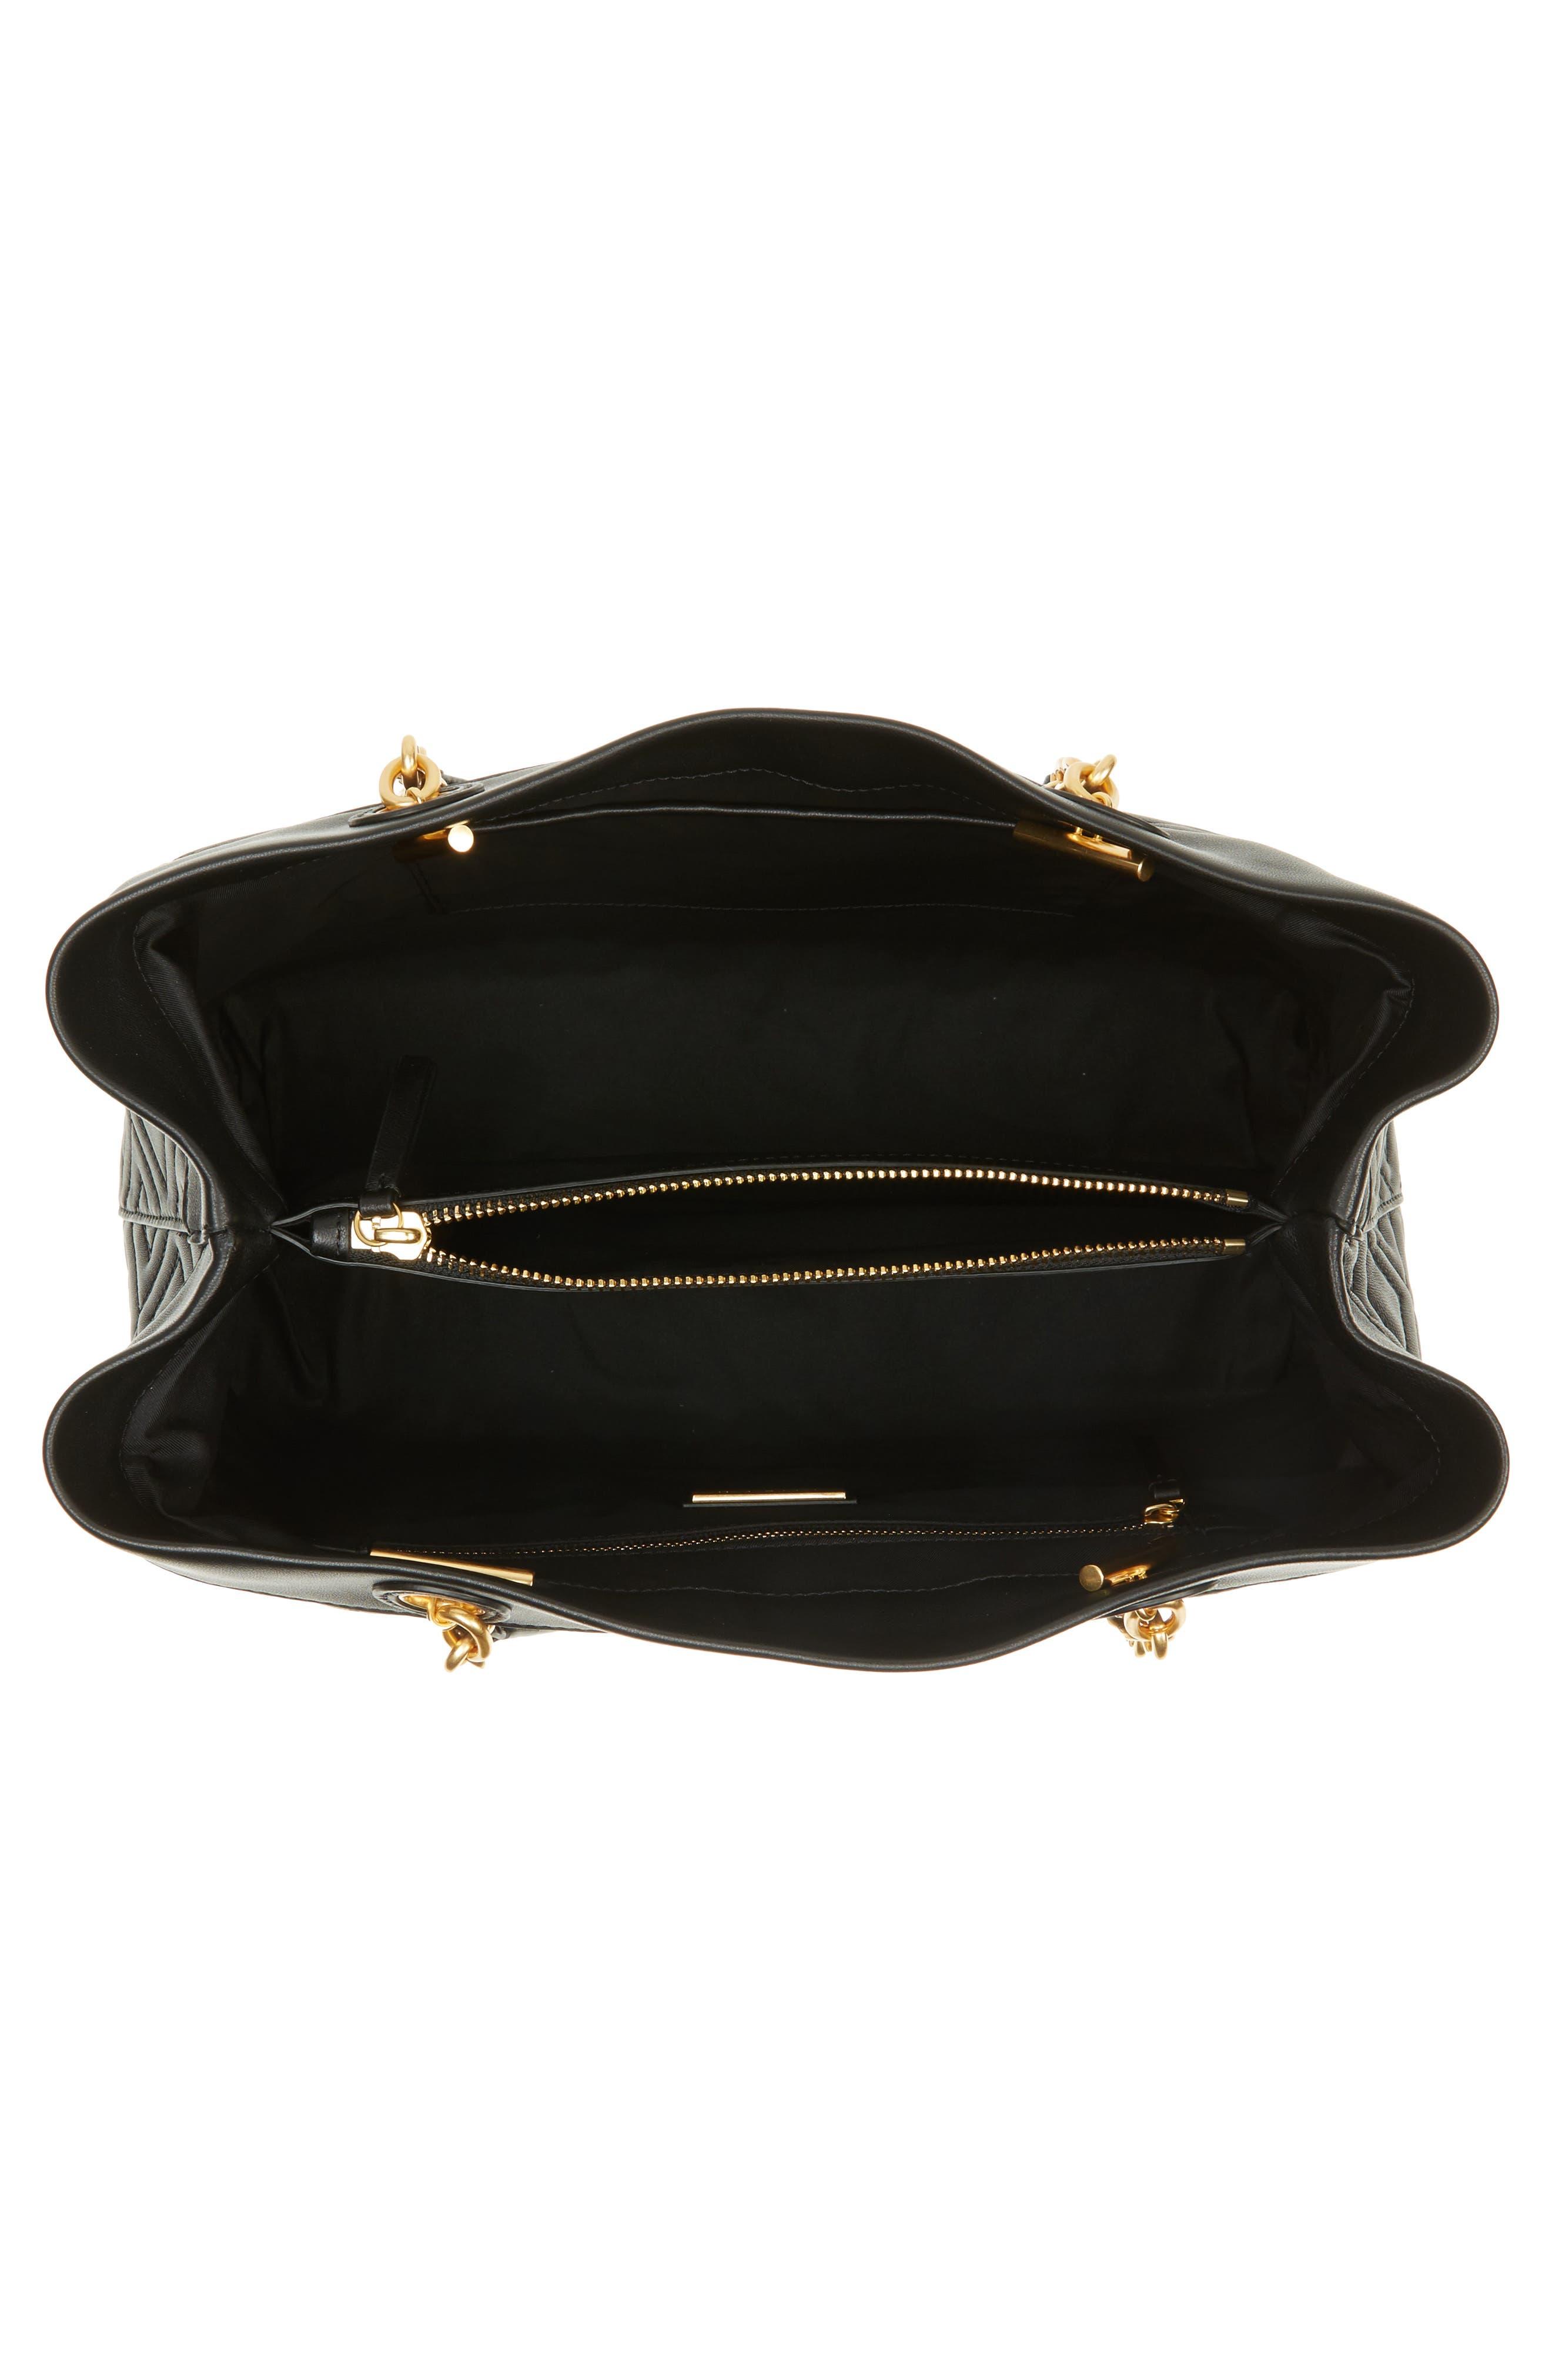 Lousia Lambskin Leather Tote,                             Alternate thumbnail 3, color,                             Black